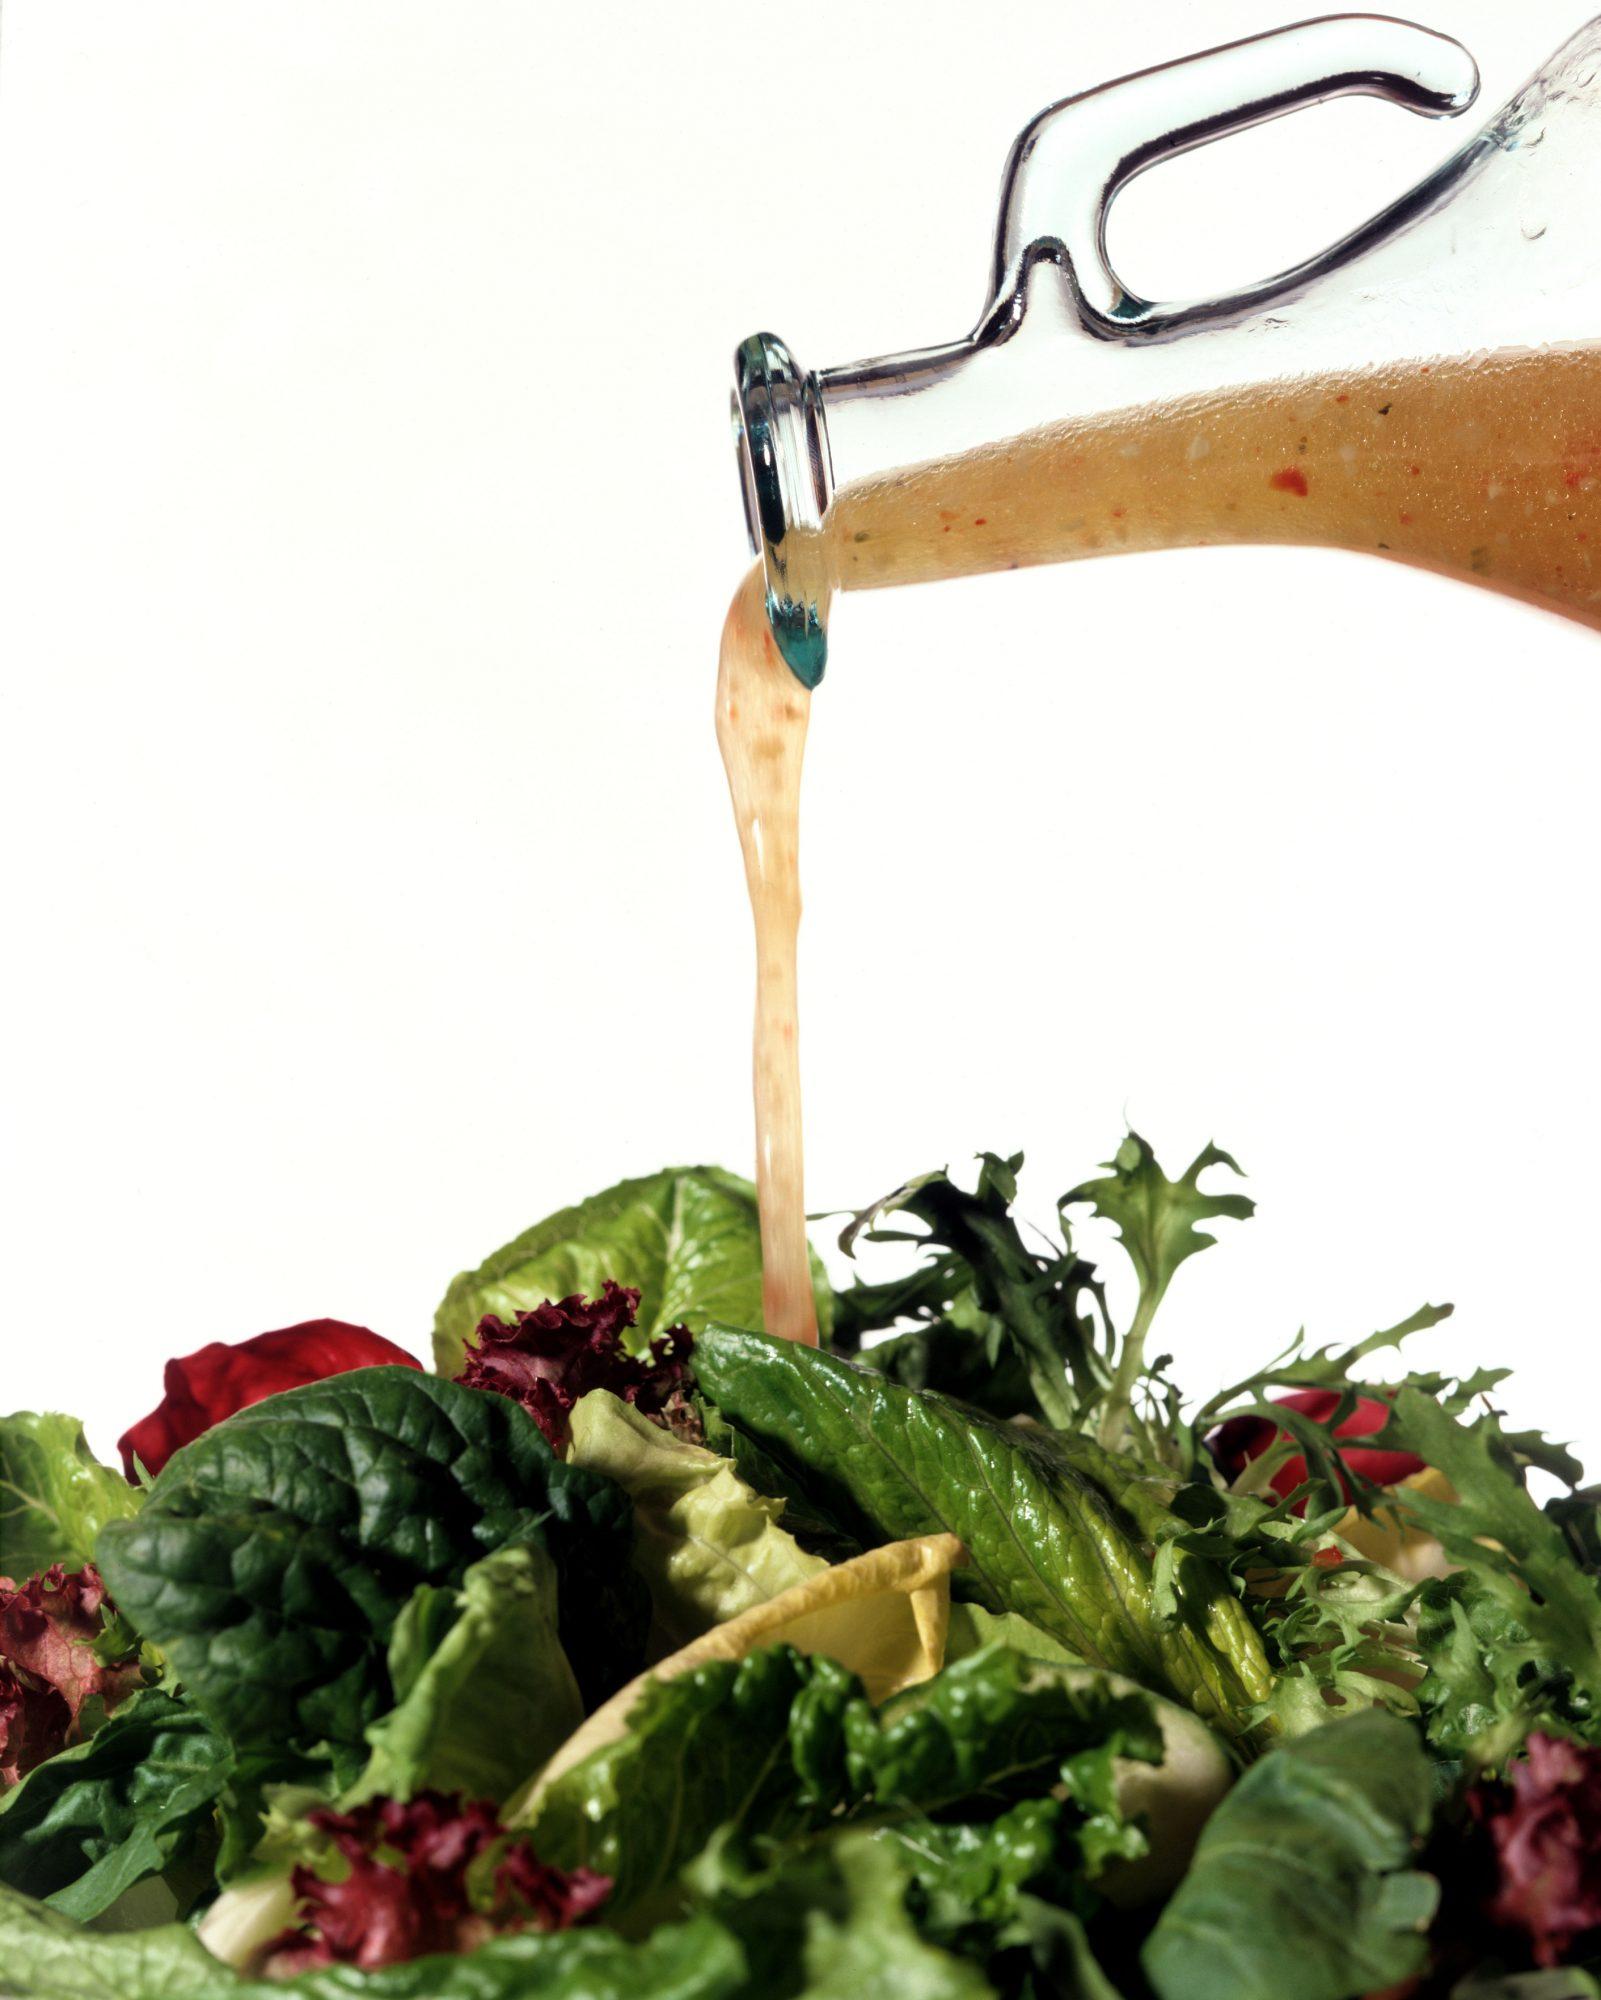 getty-salad-dressing-image